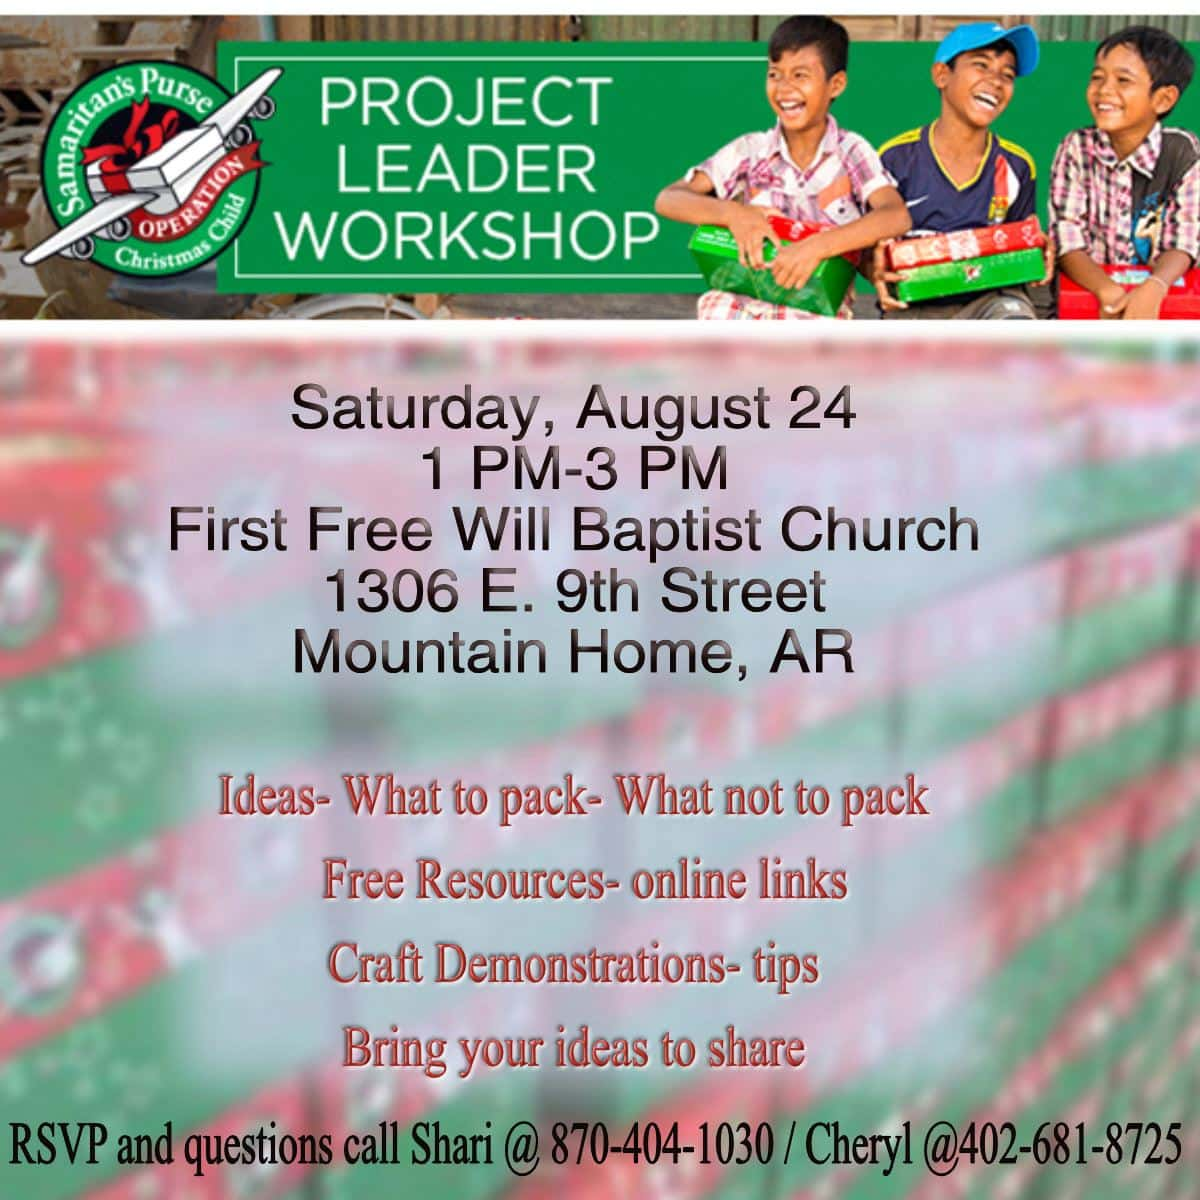 Operation Christmas Child 2019 Dates.Operation Christmas Child Project Leader Workshop Ktlo Llc